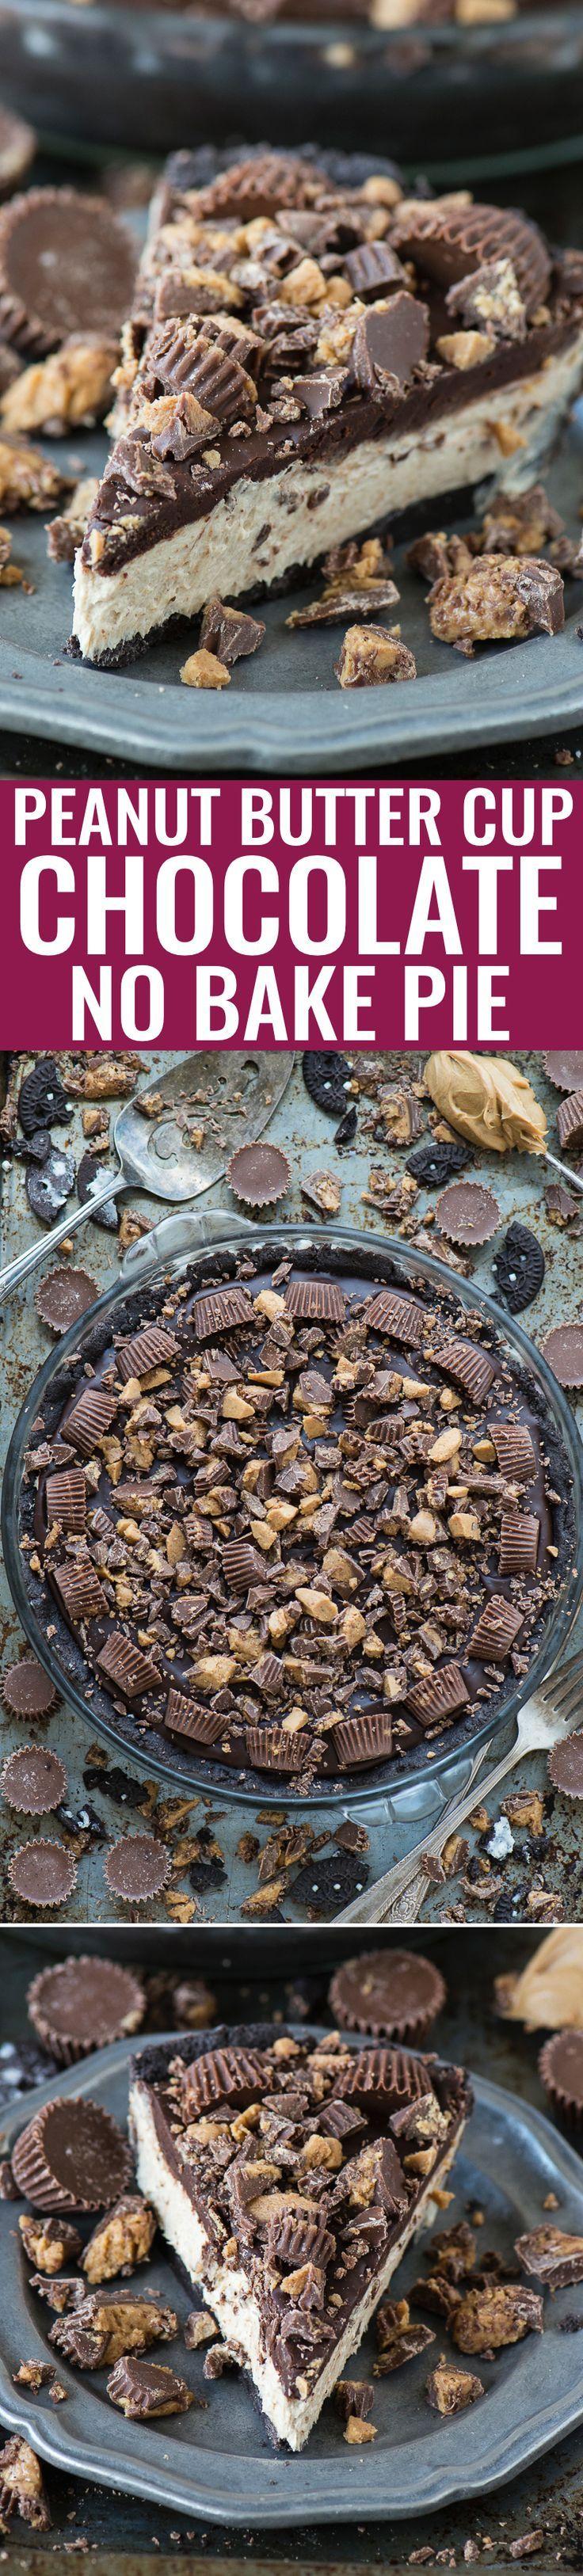 no bake peanut butter cup chocolate pie! Oreo crust, creamy peanut ...